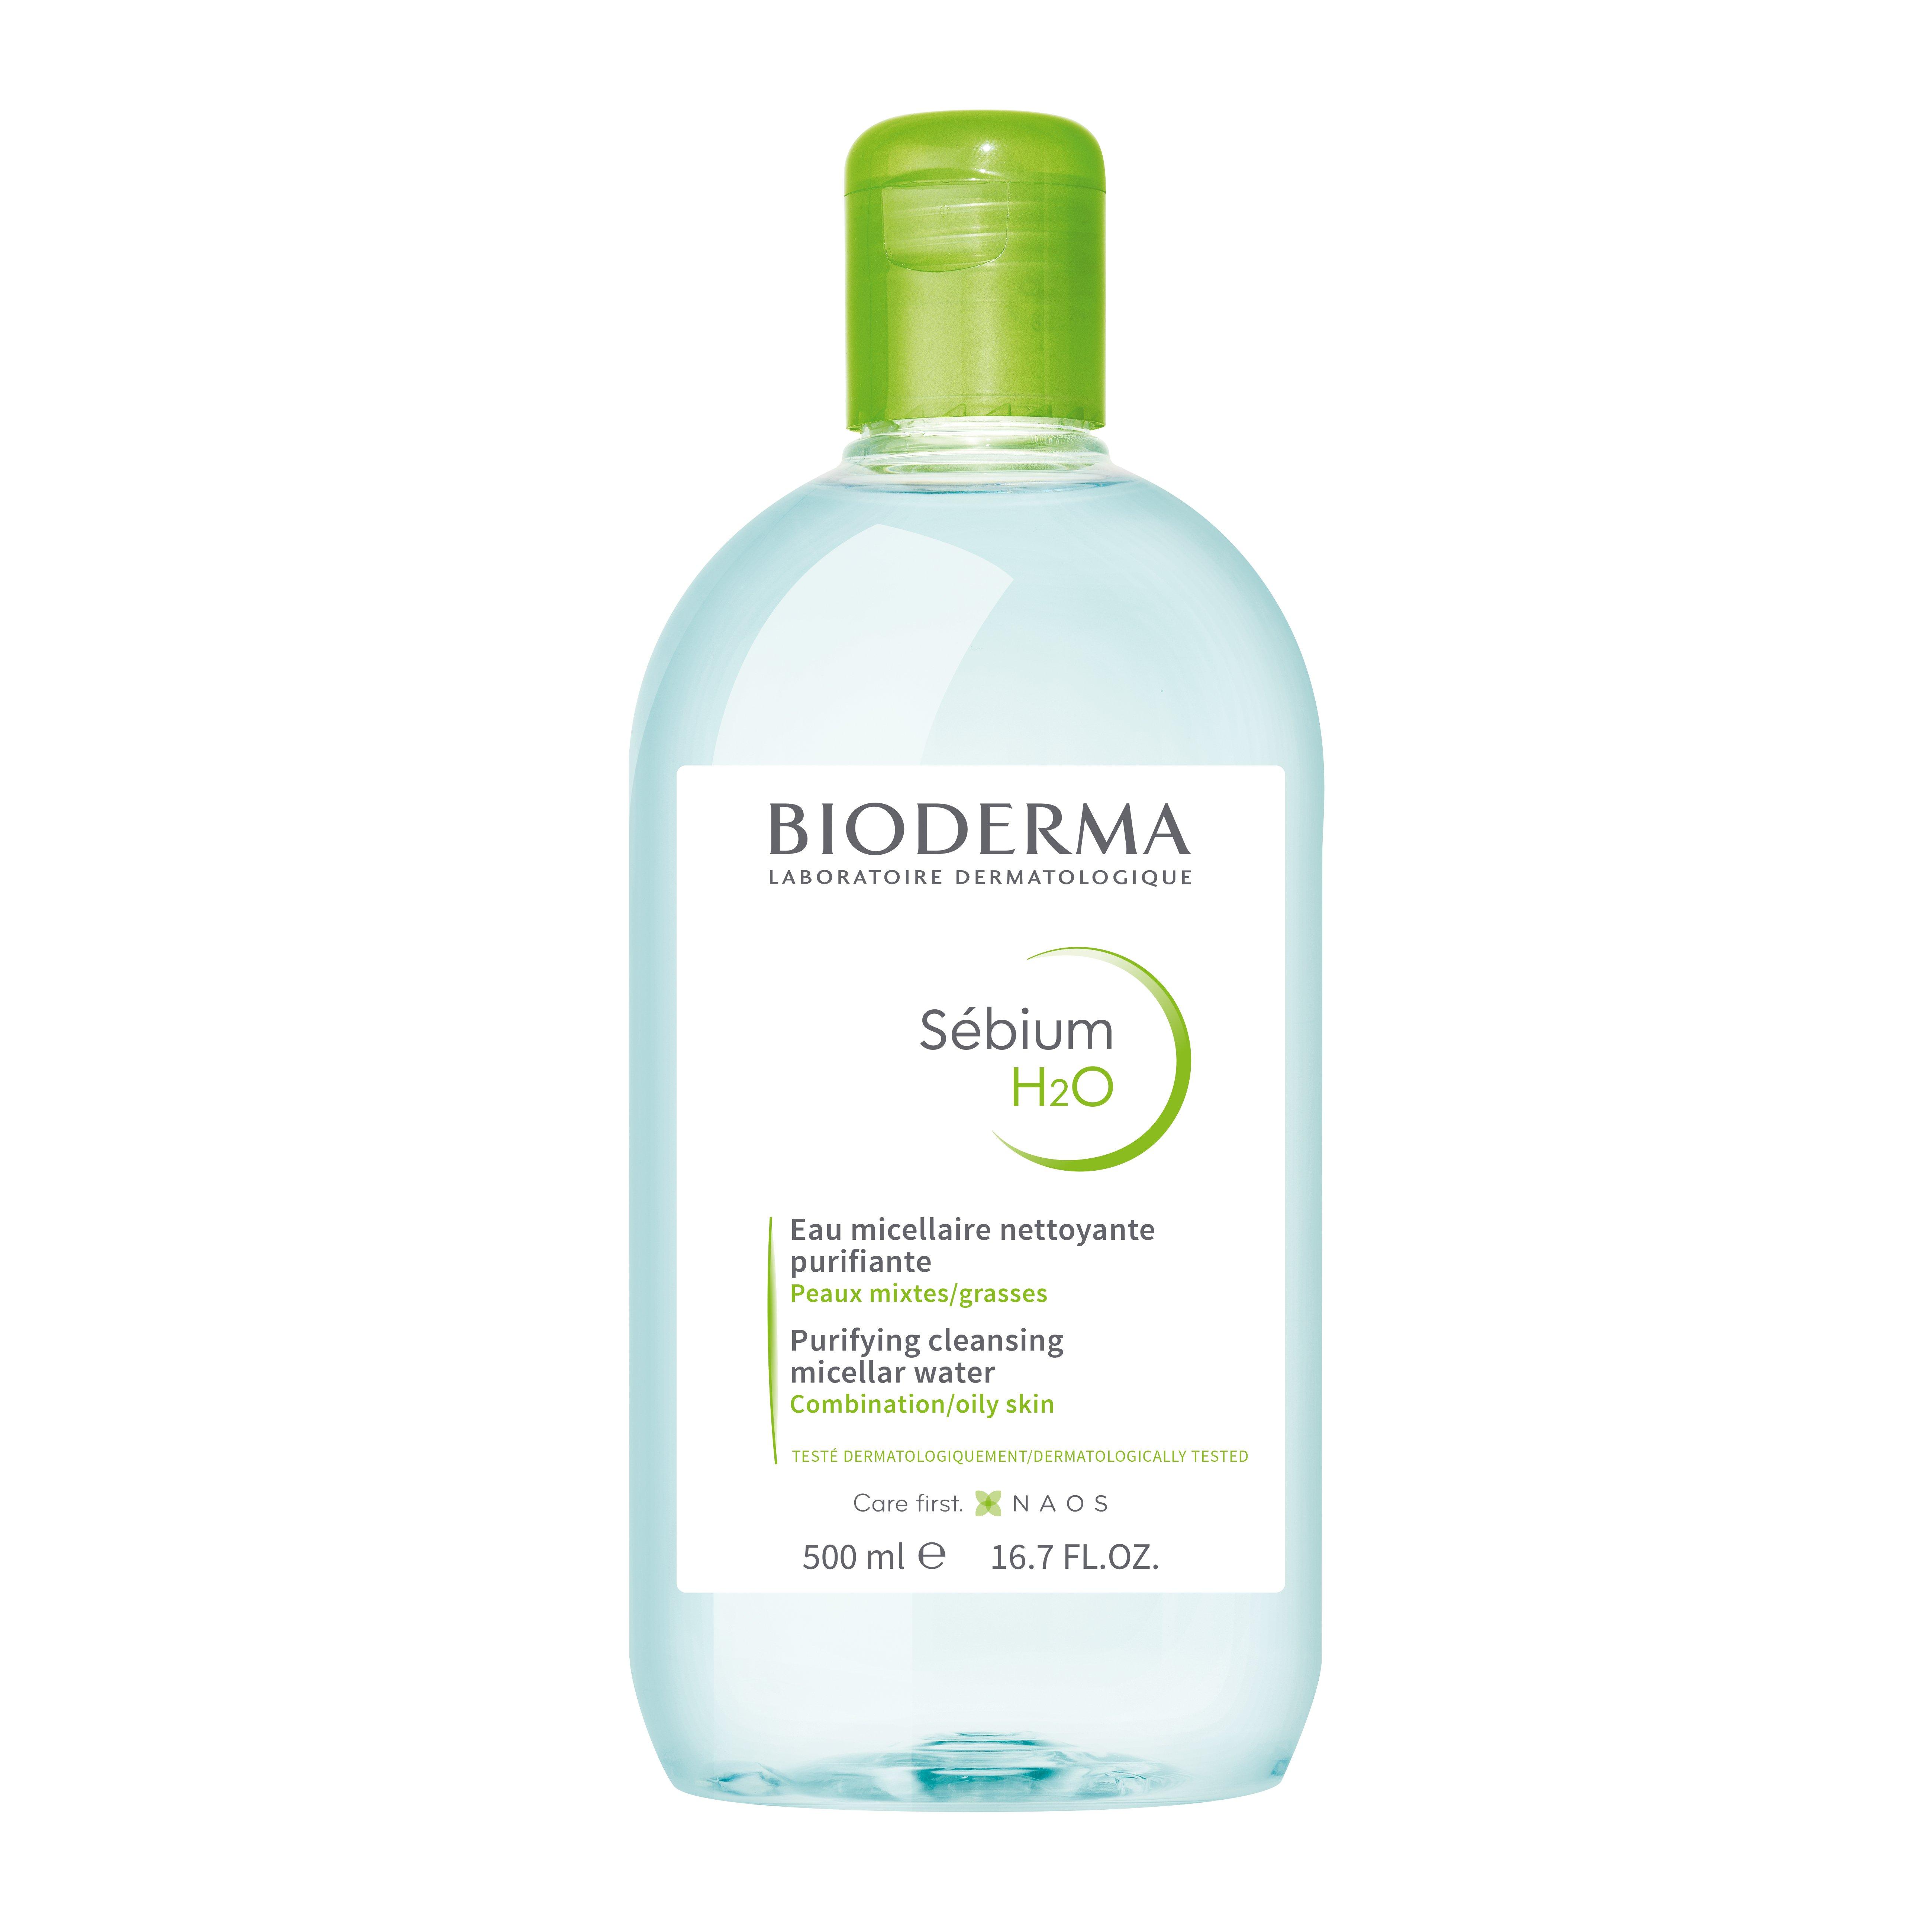 Bioderma - Sebium H2O Purifying Cleansing Micellar Solution 500ml